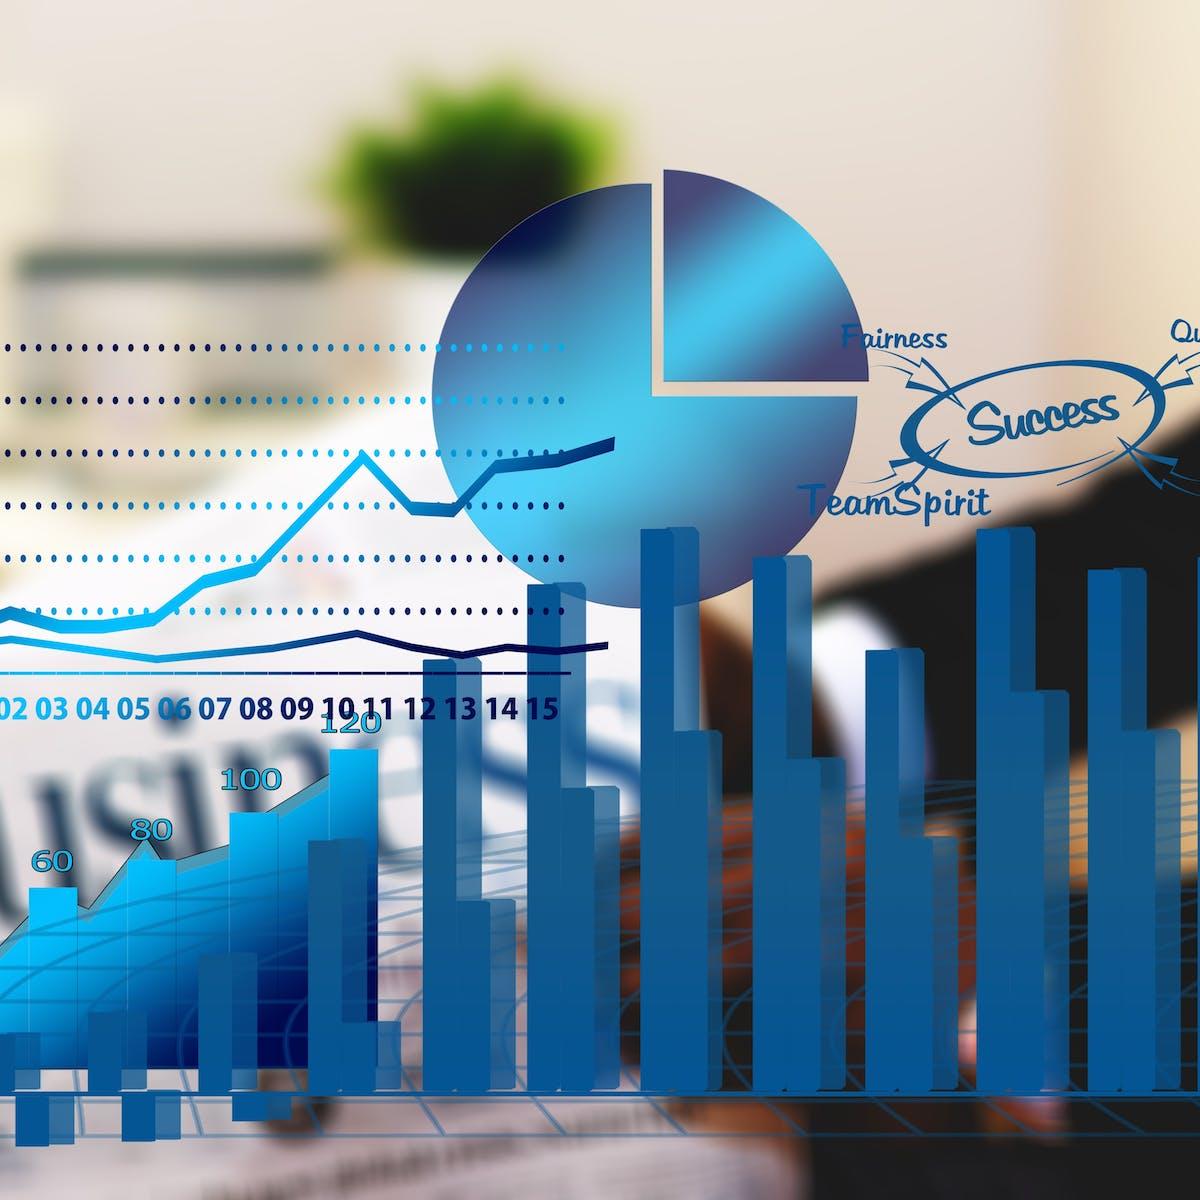 Titelbild-Projektrentabilität-Projektmanagement-Zahlen-Statistik-2899906-pixabay-geralt